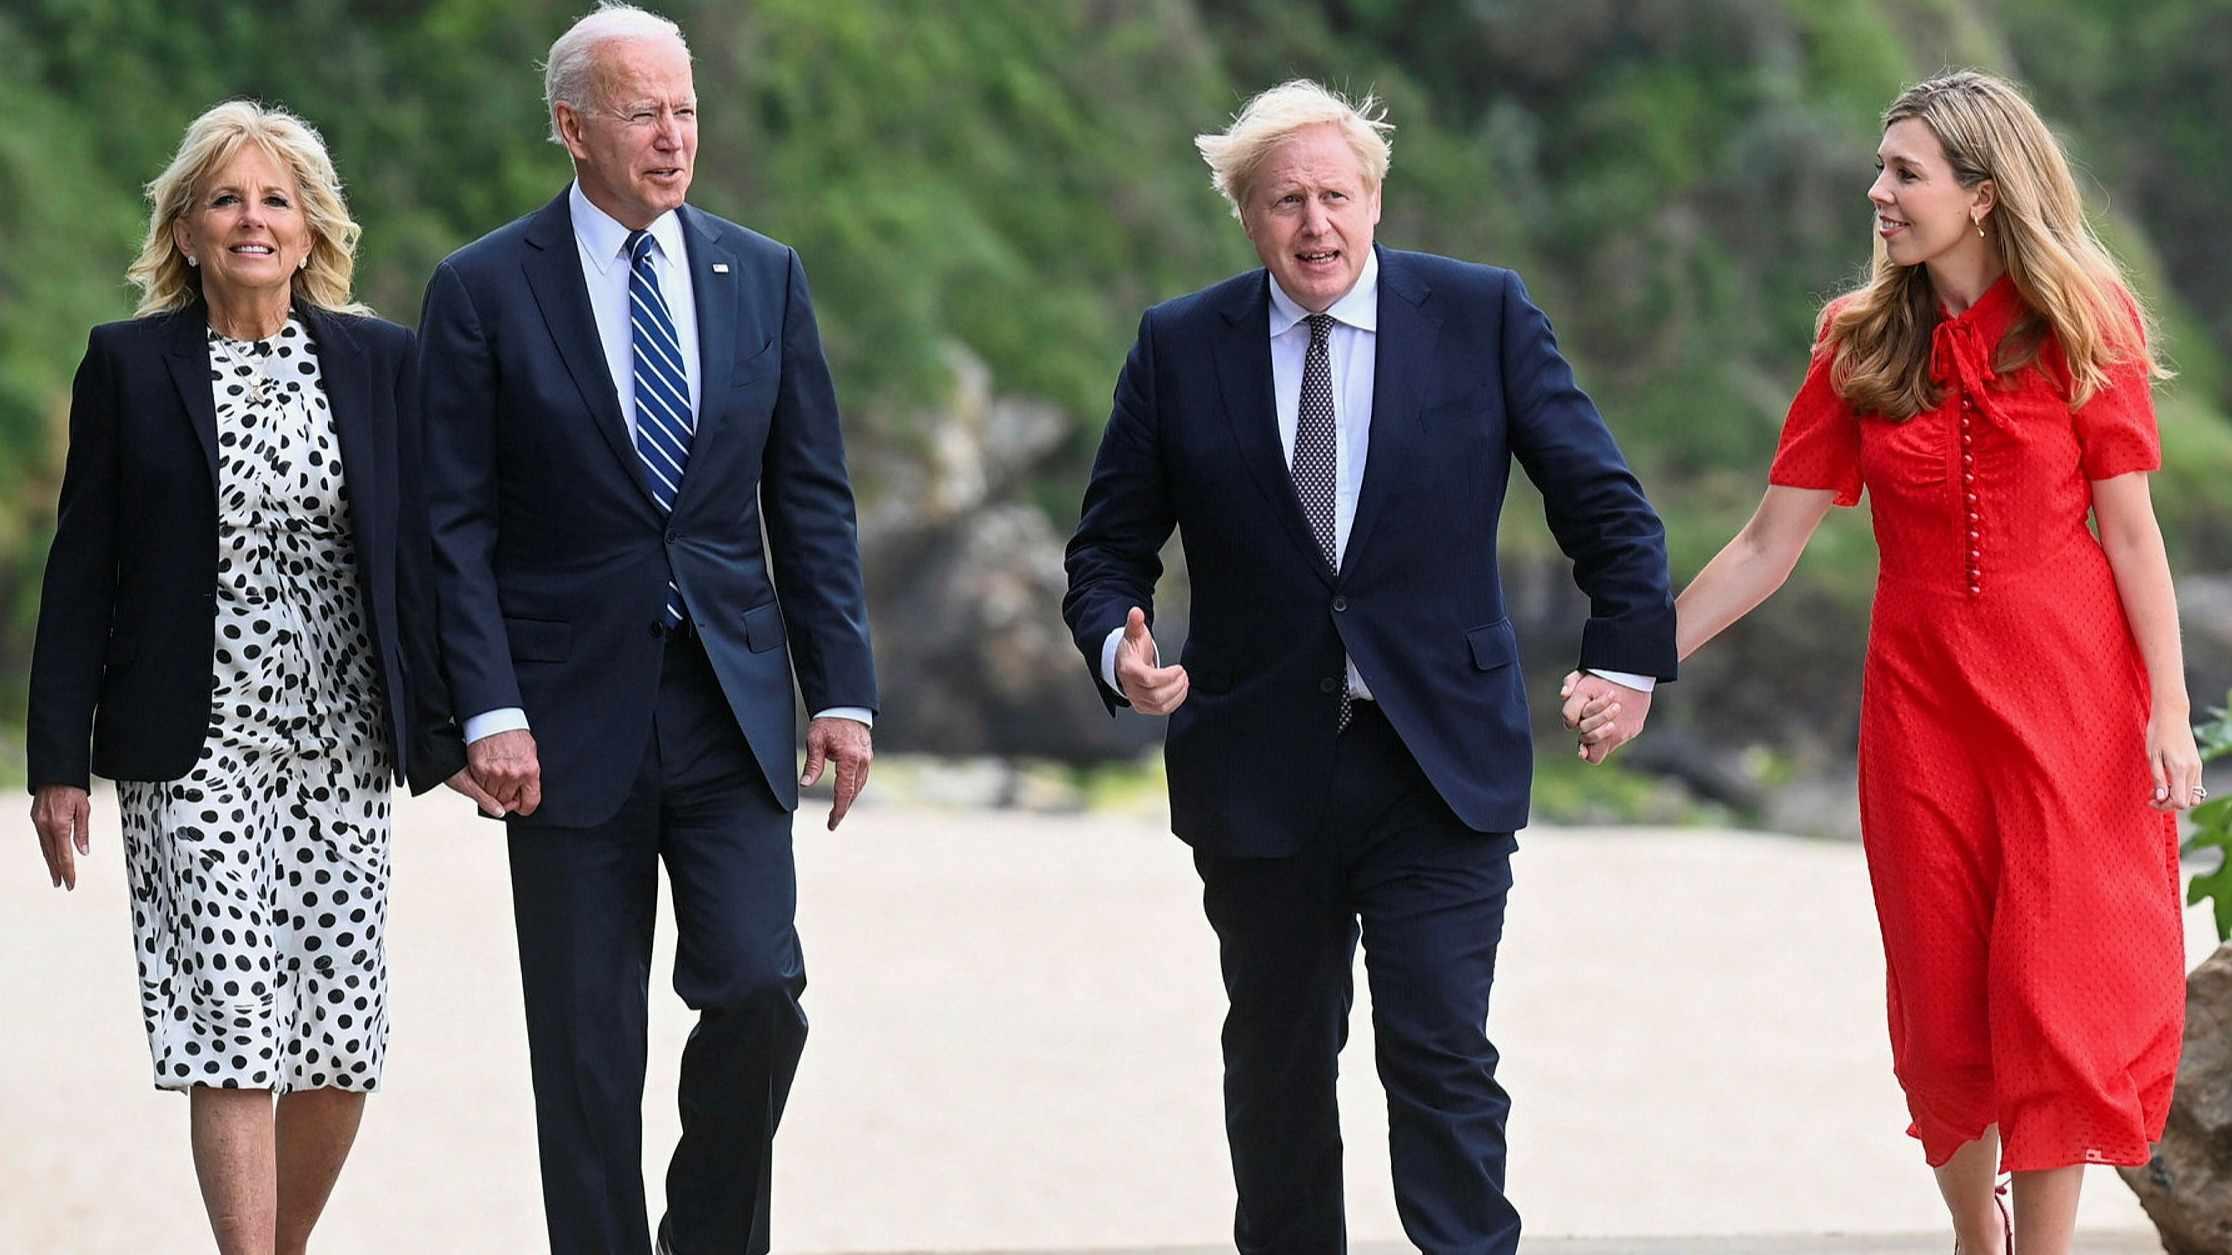 g7 leaders poorer countries pledge